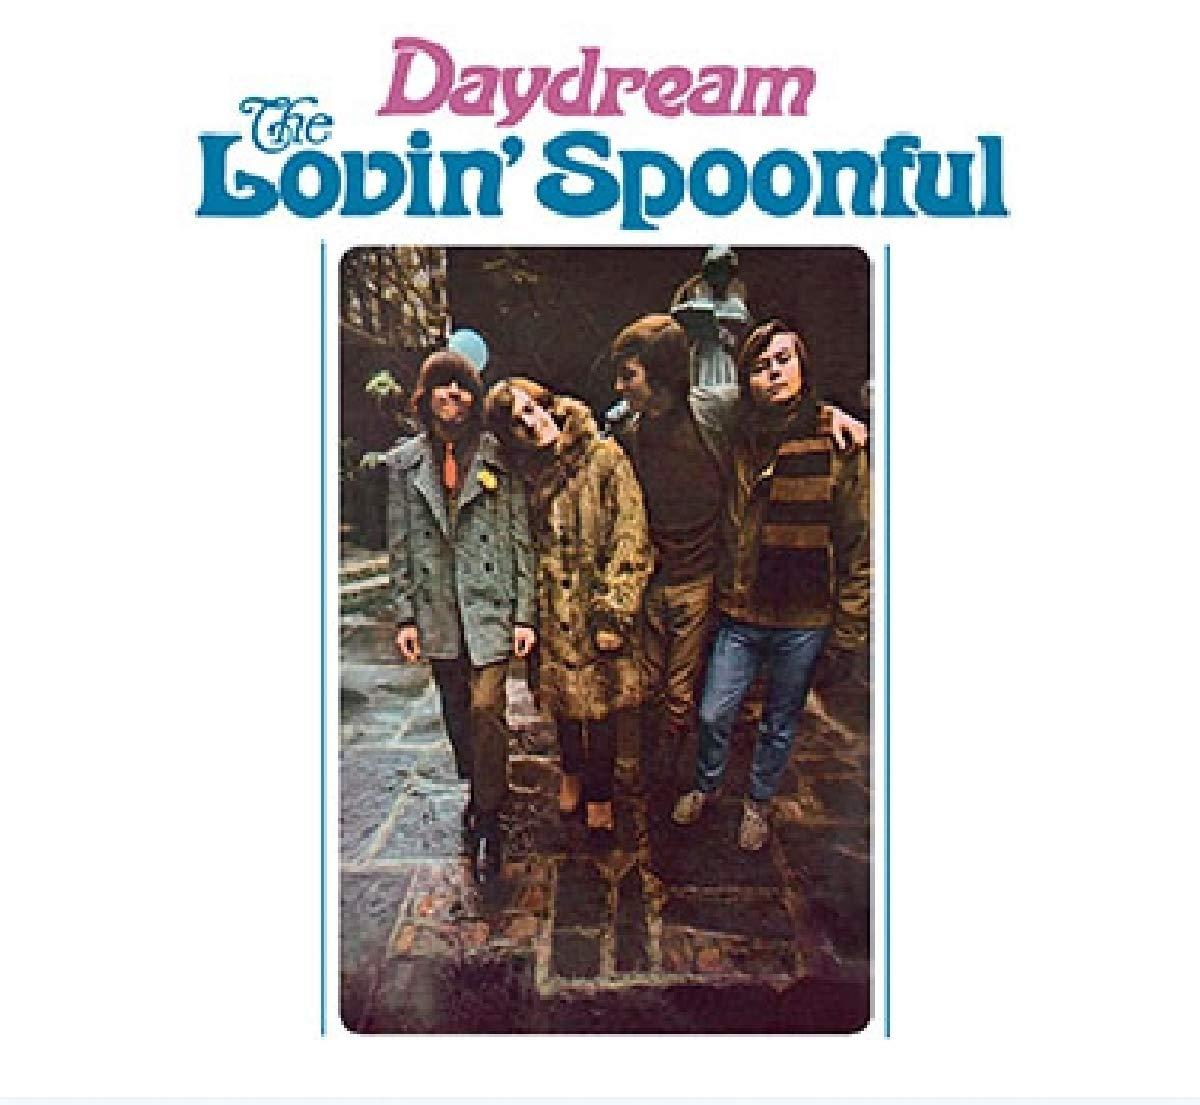 Daydream Special Campaign Fashion